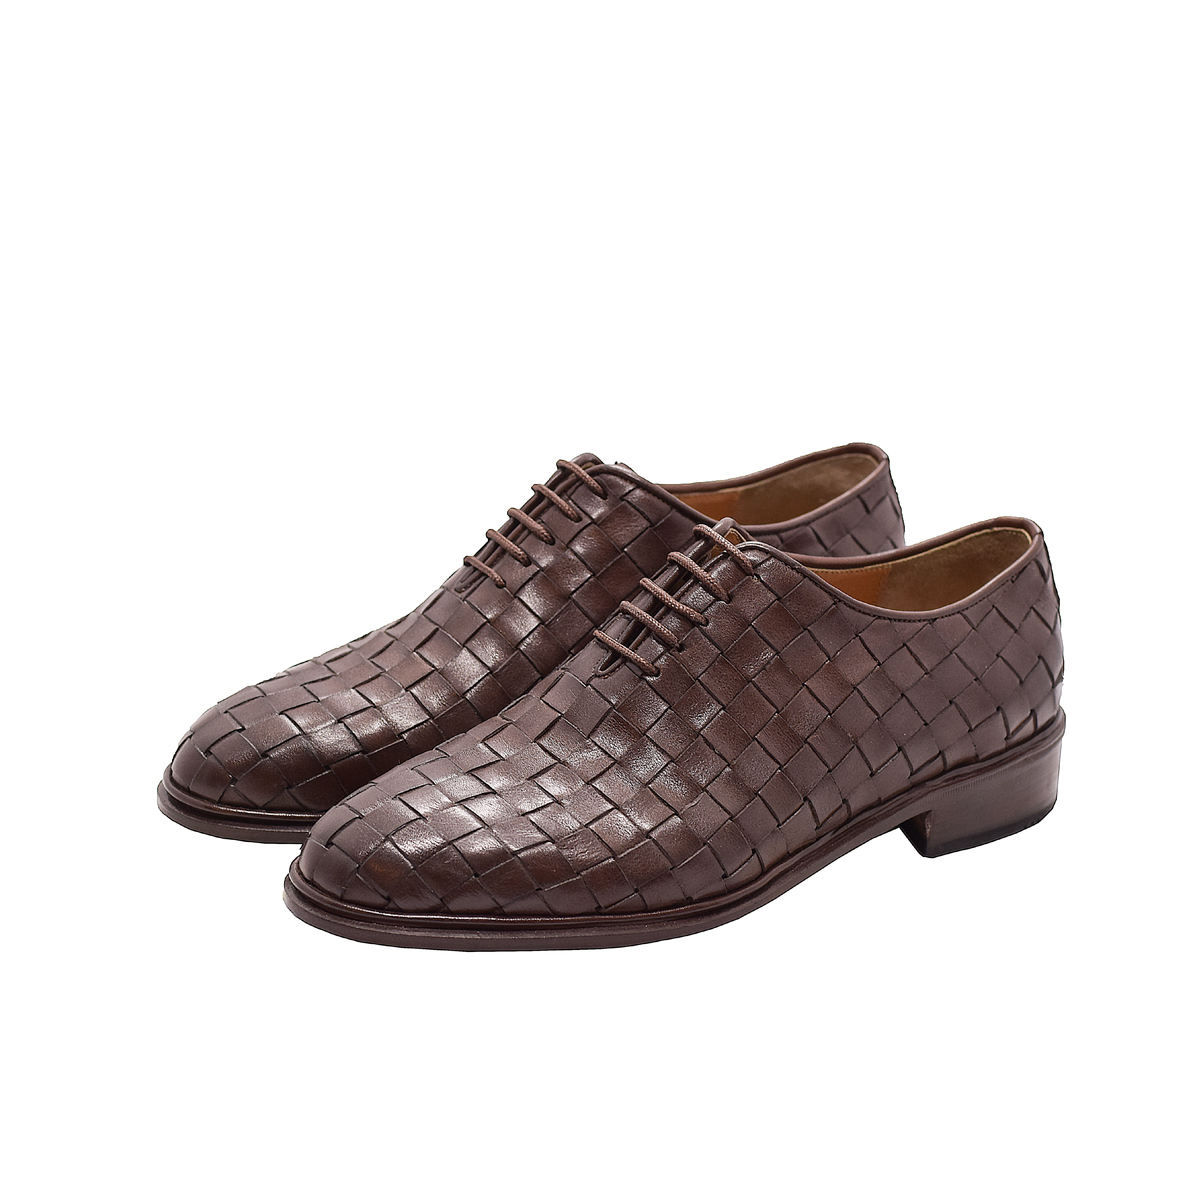 کفش مردانه دگرمان مدل بوریا کد deg.2br2102 -  - 4